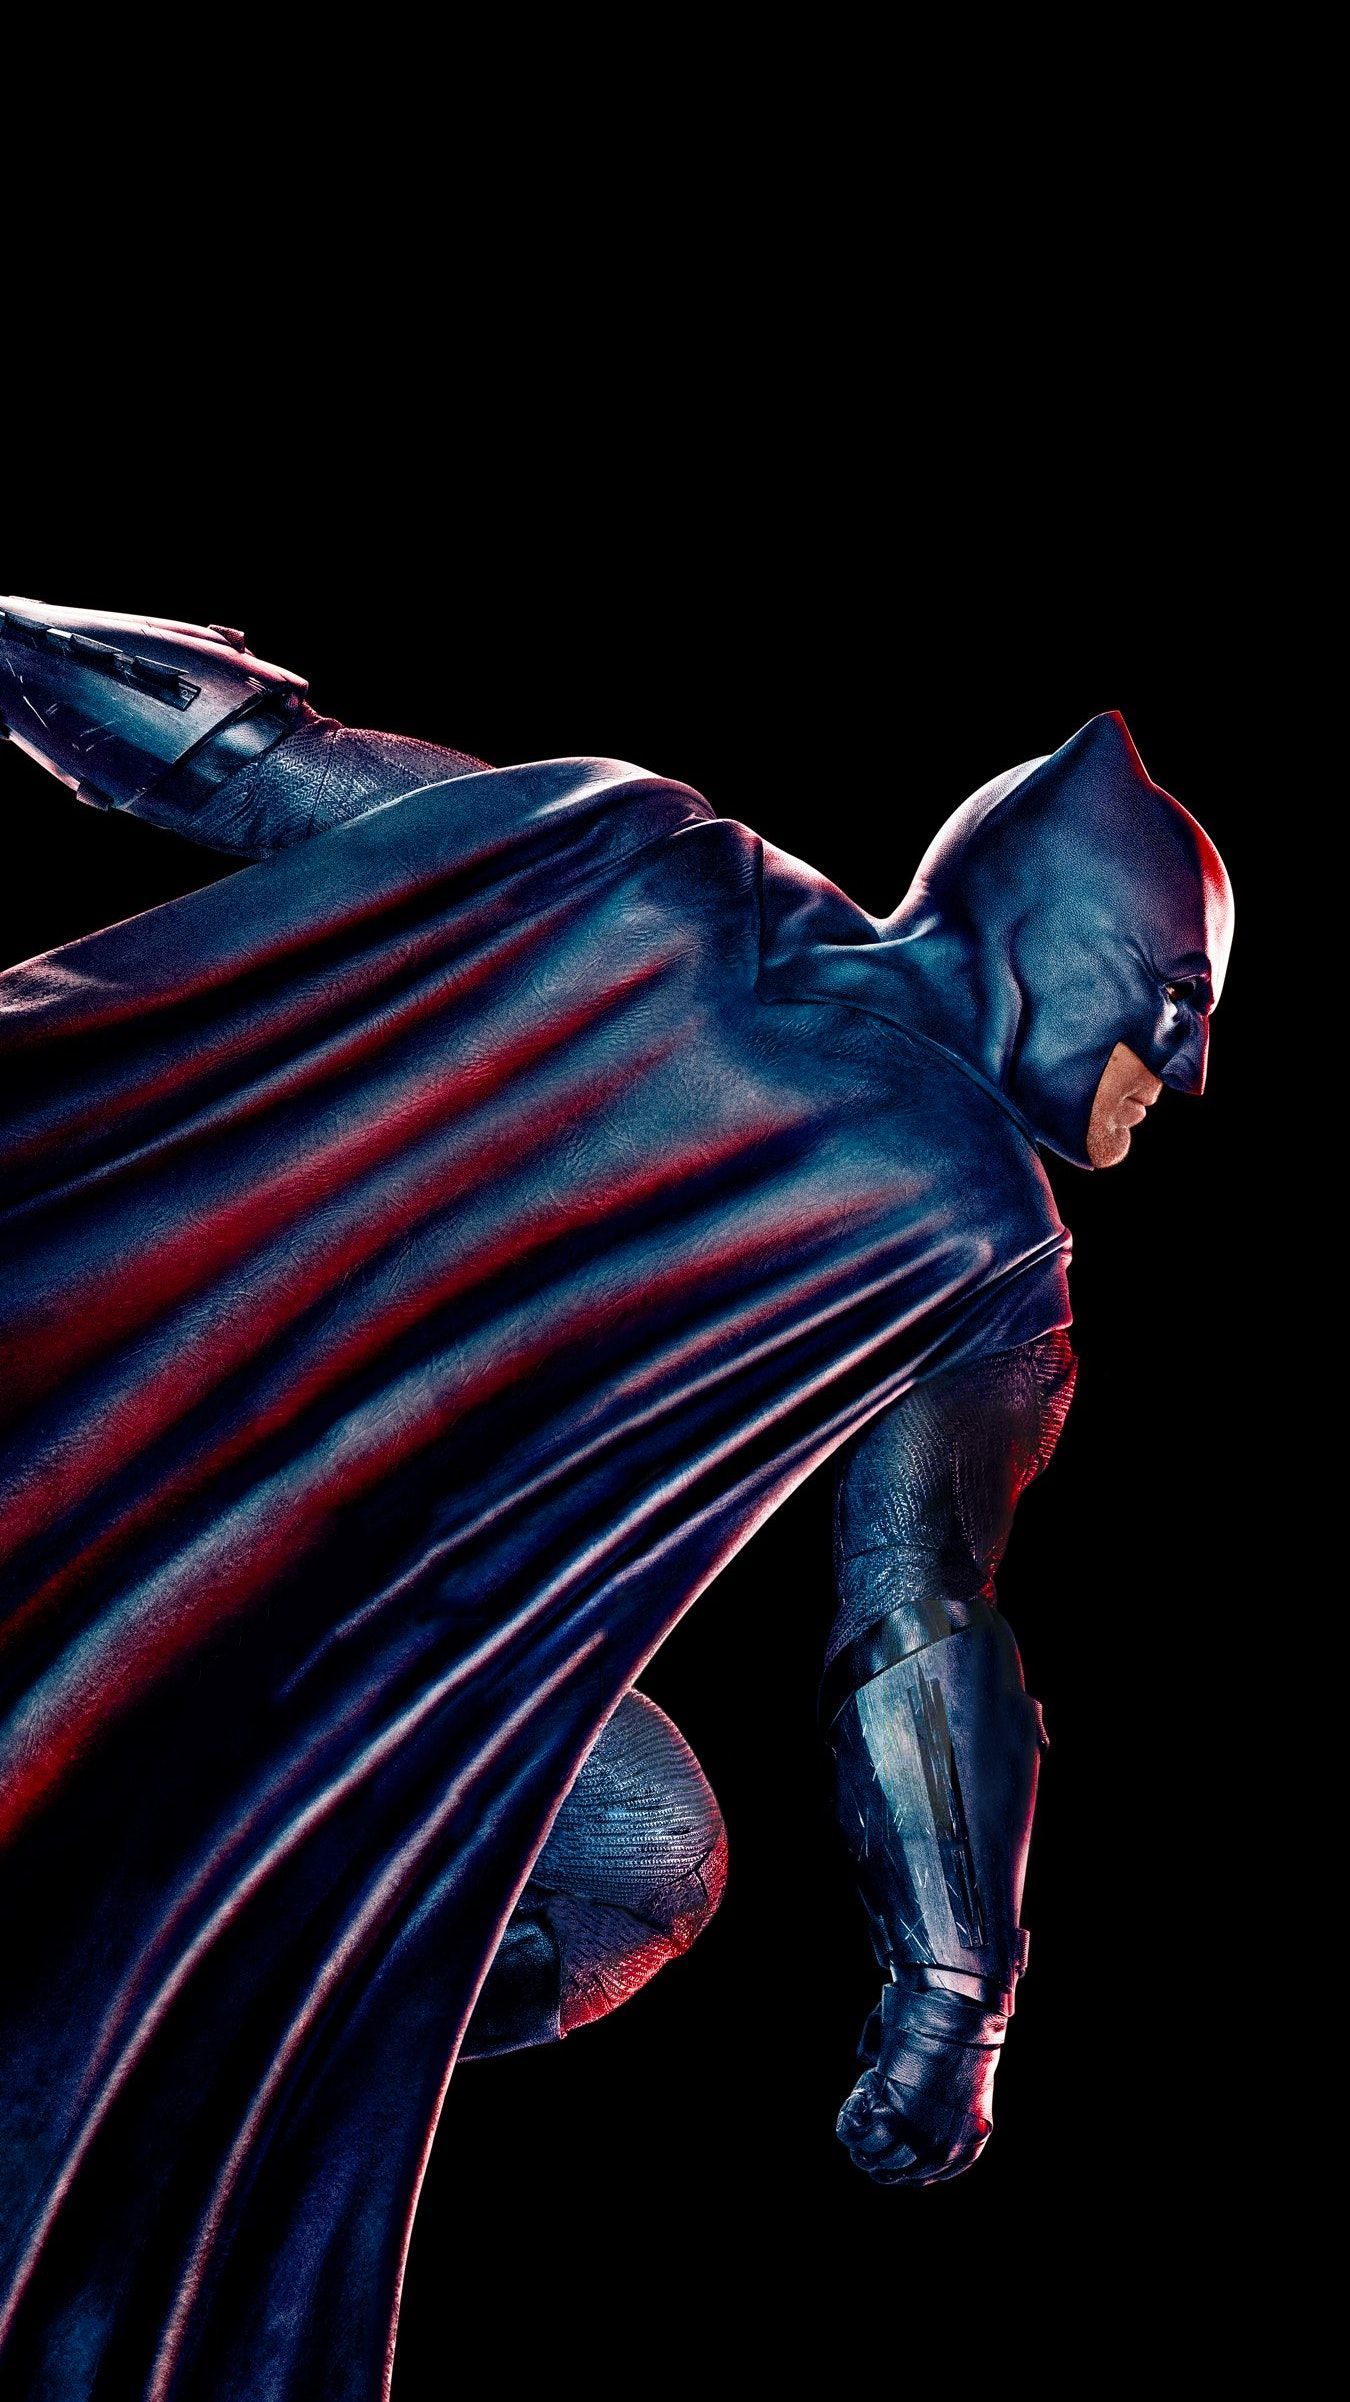 Justice League (2017) Phone Wallpaper Batman wallpaper